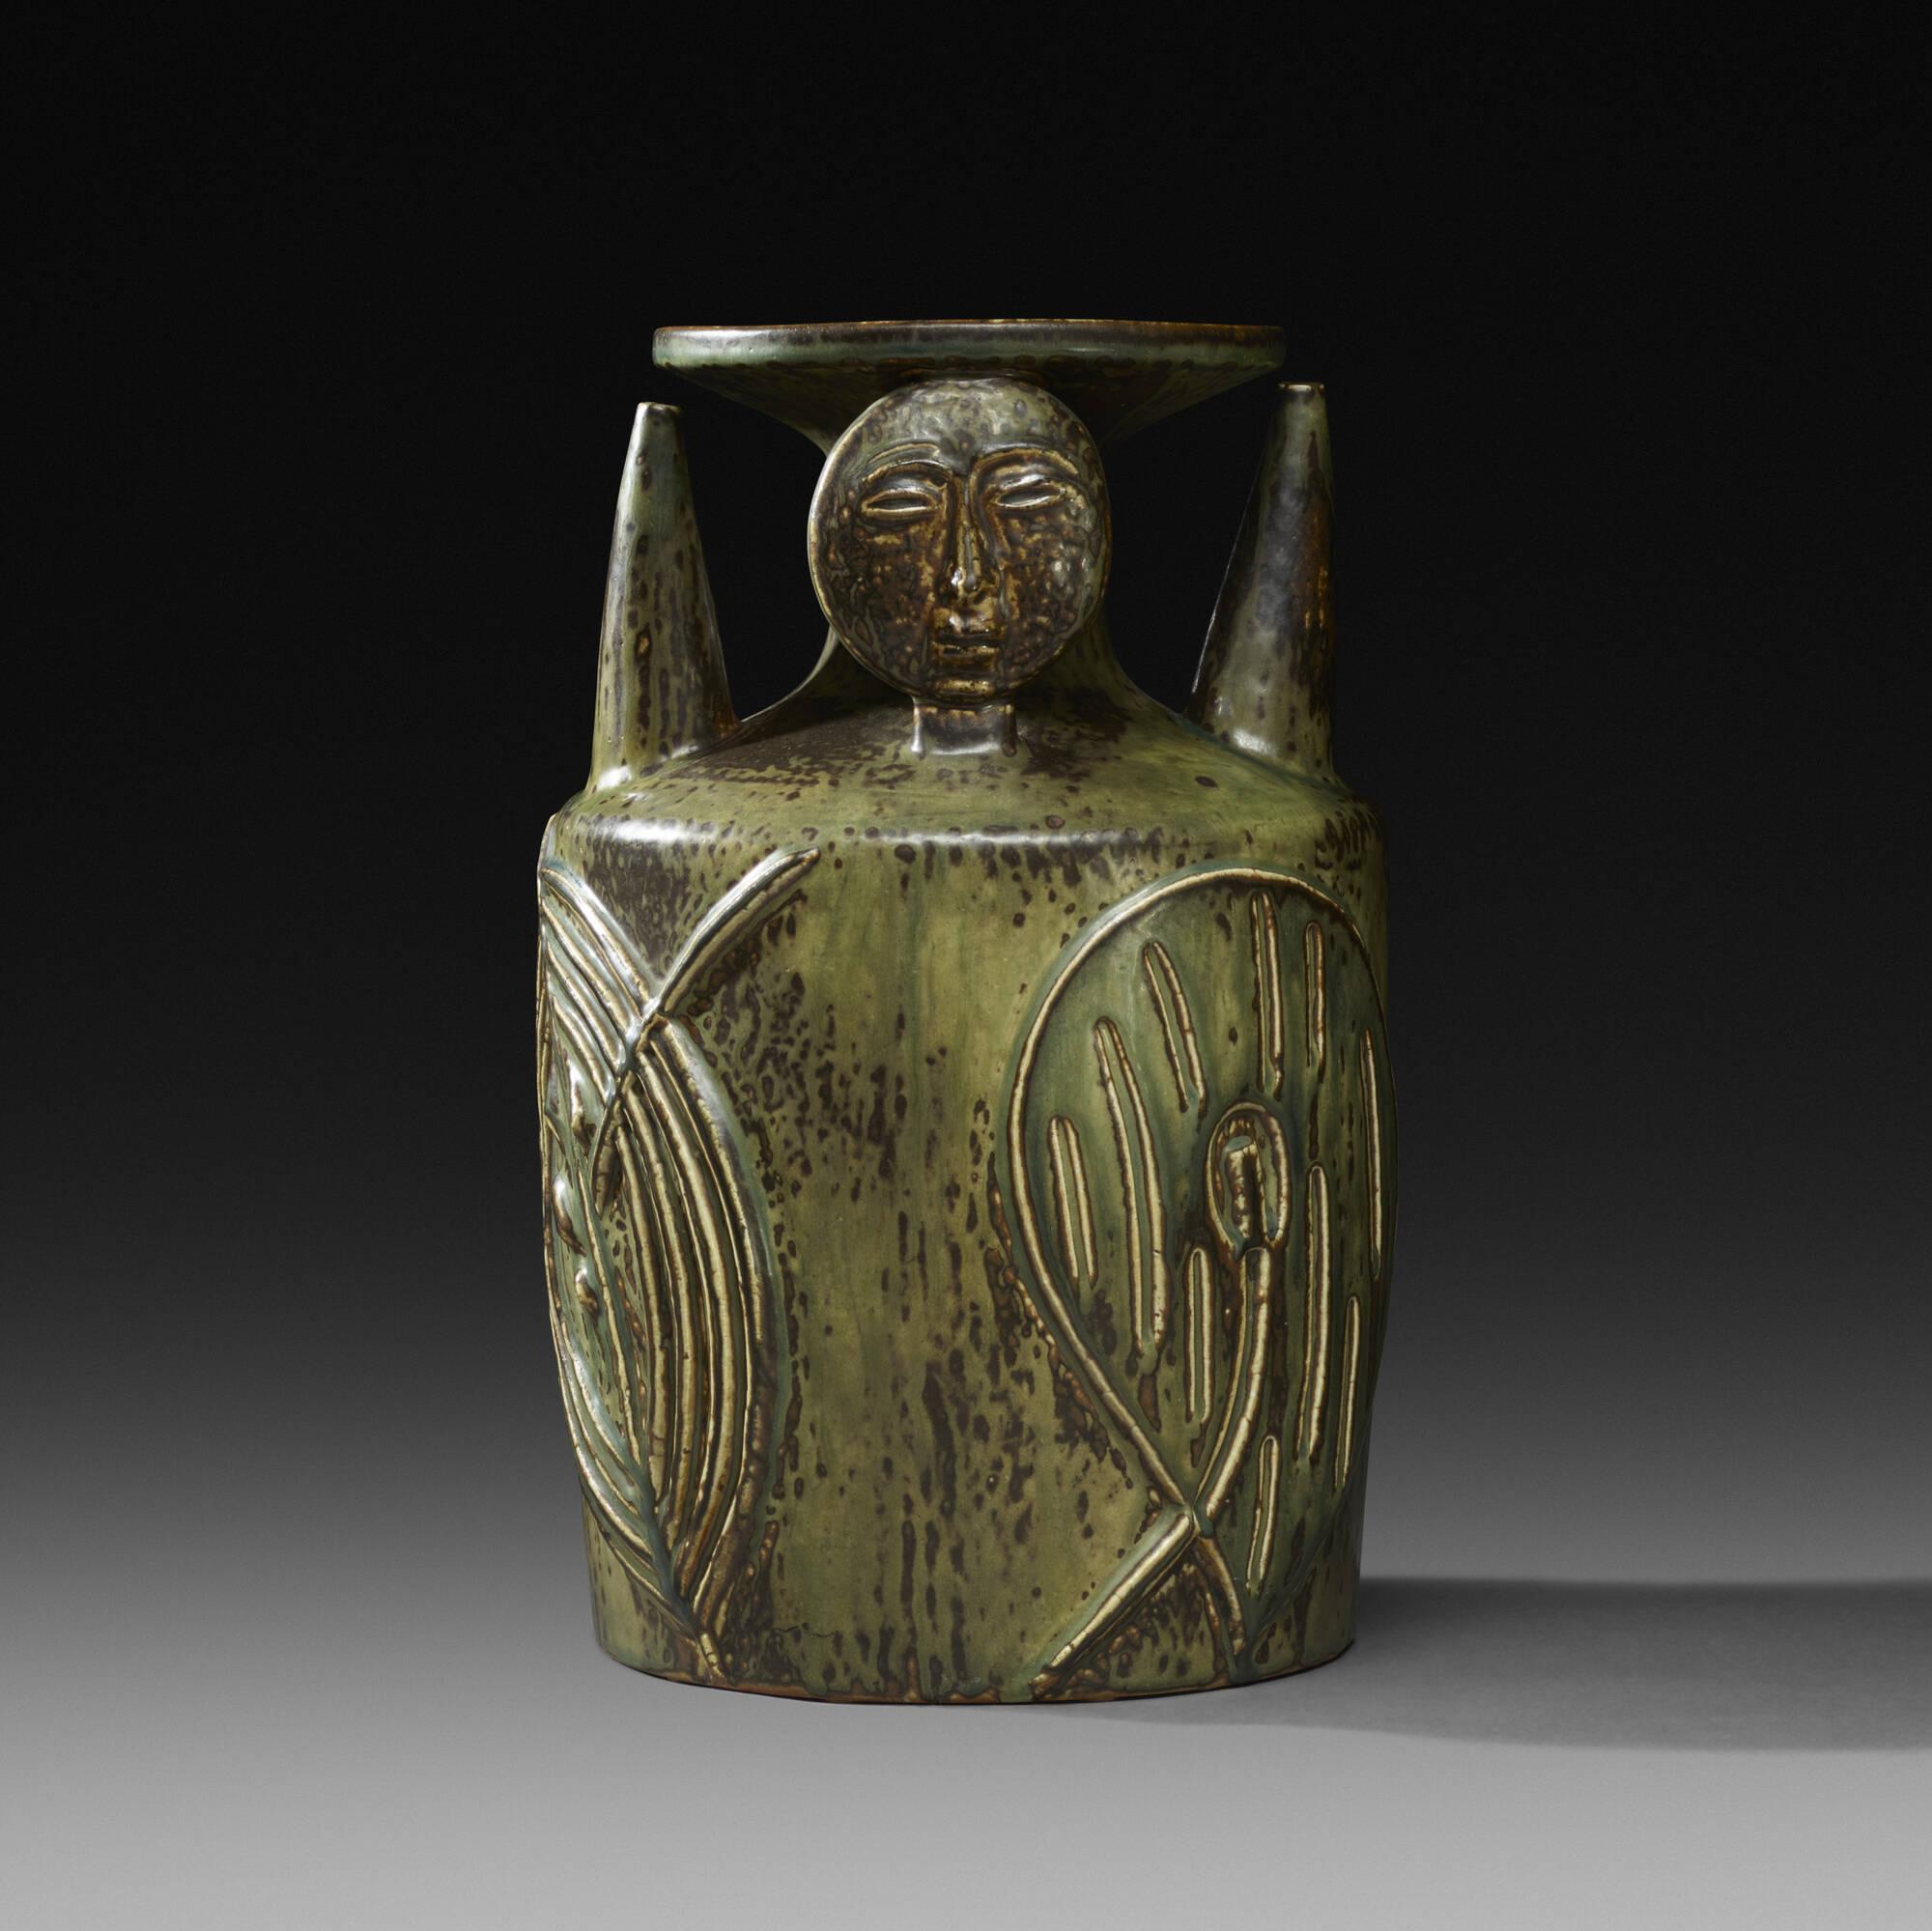 146: Axel Salto / Living Stone vase (1 of 3)